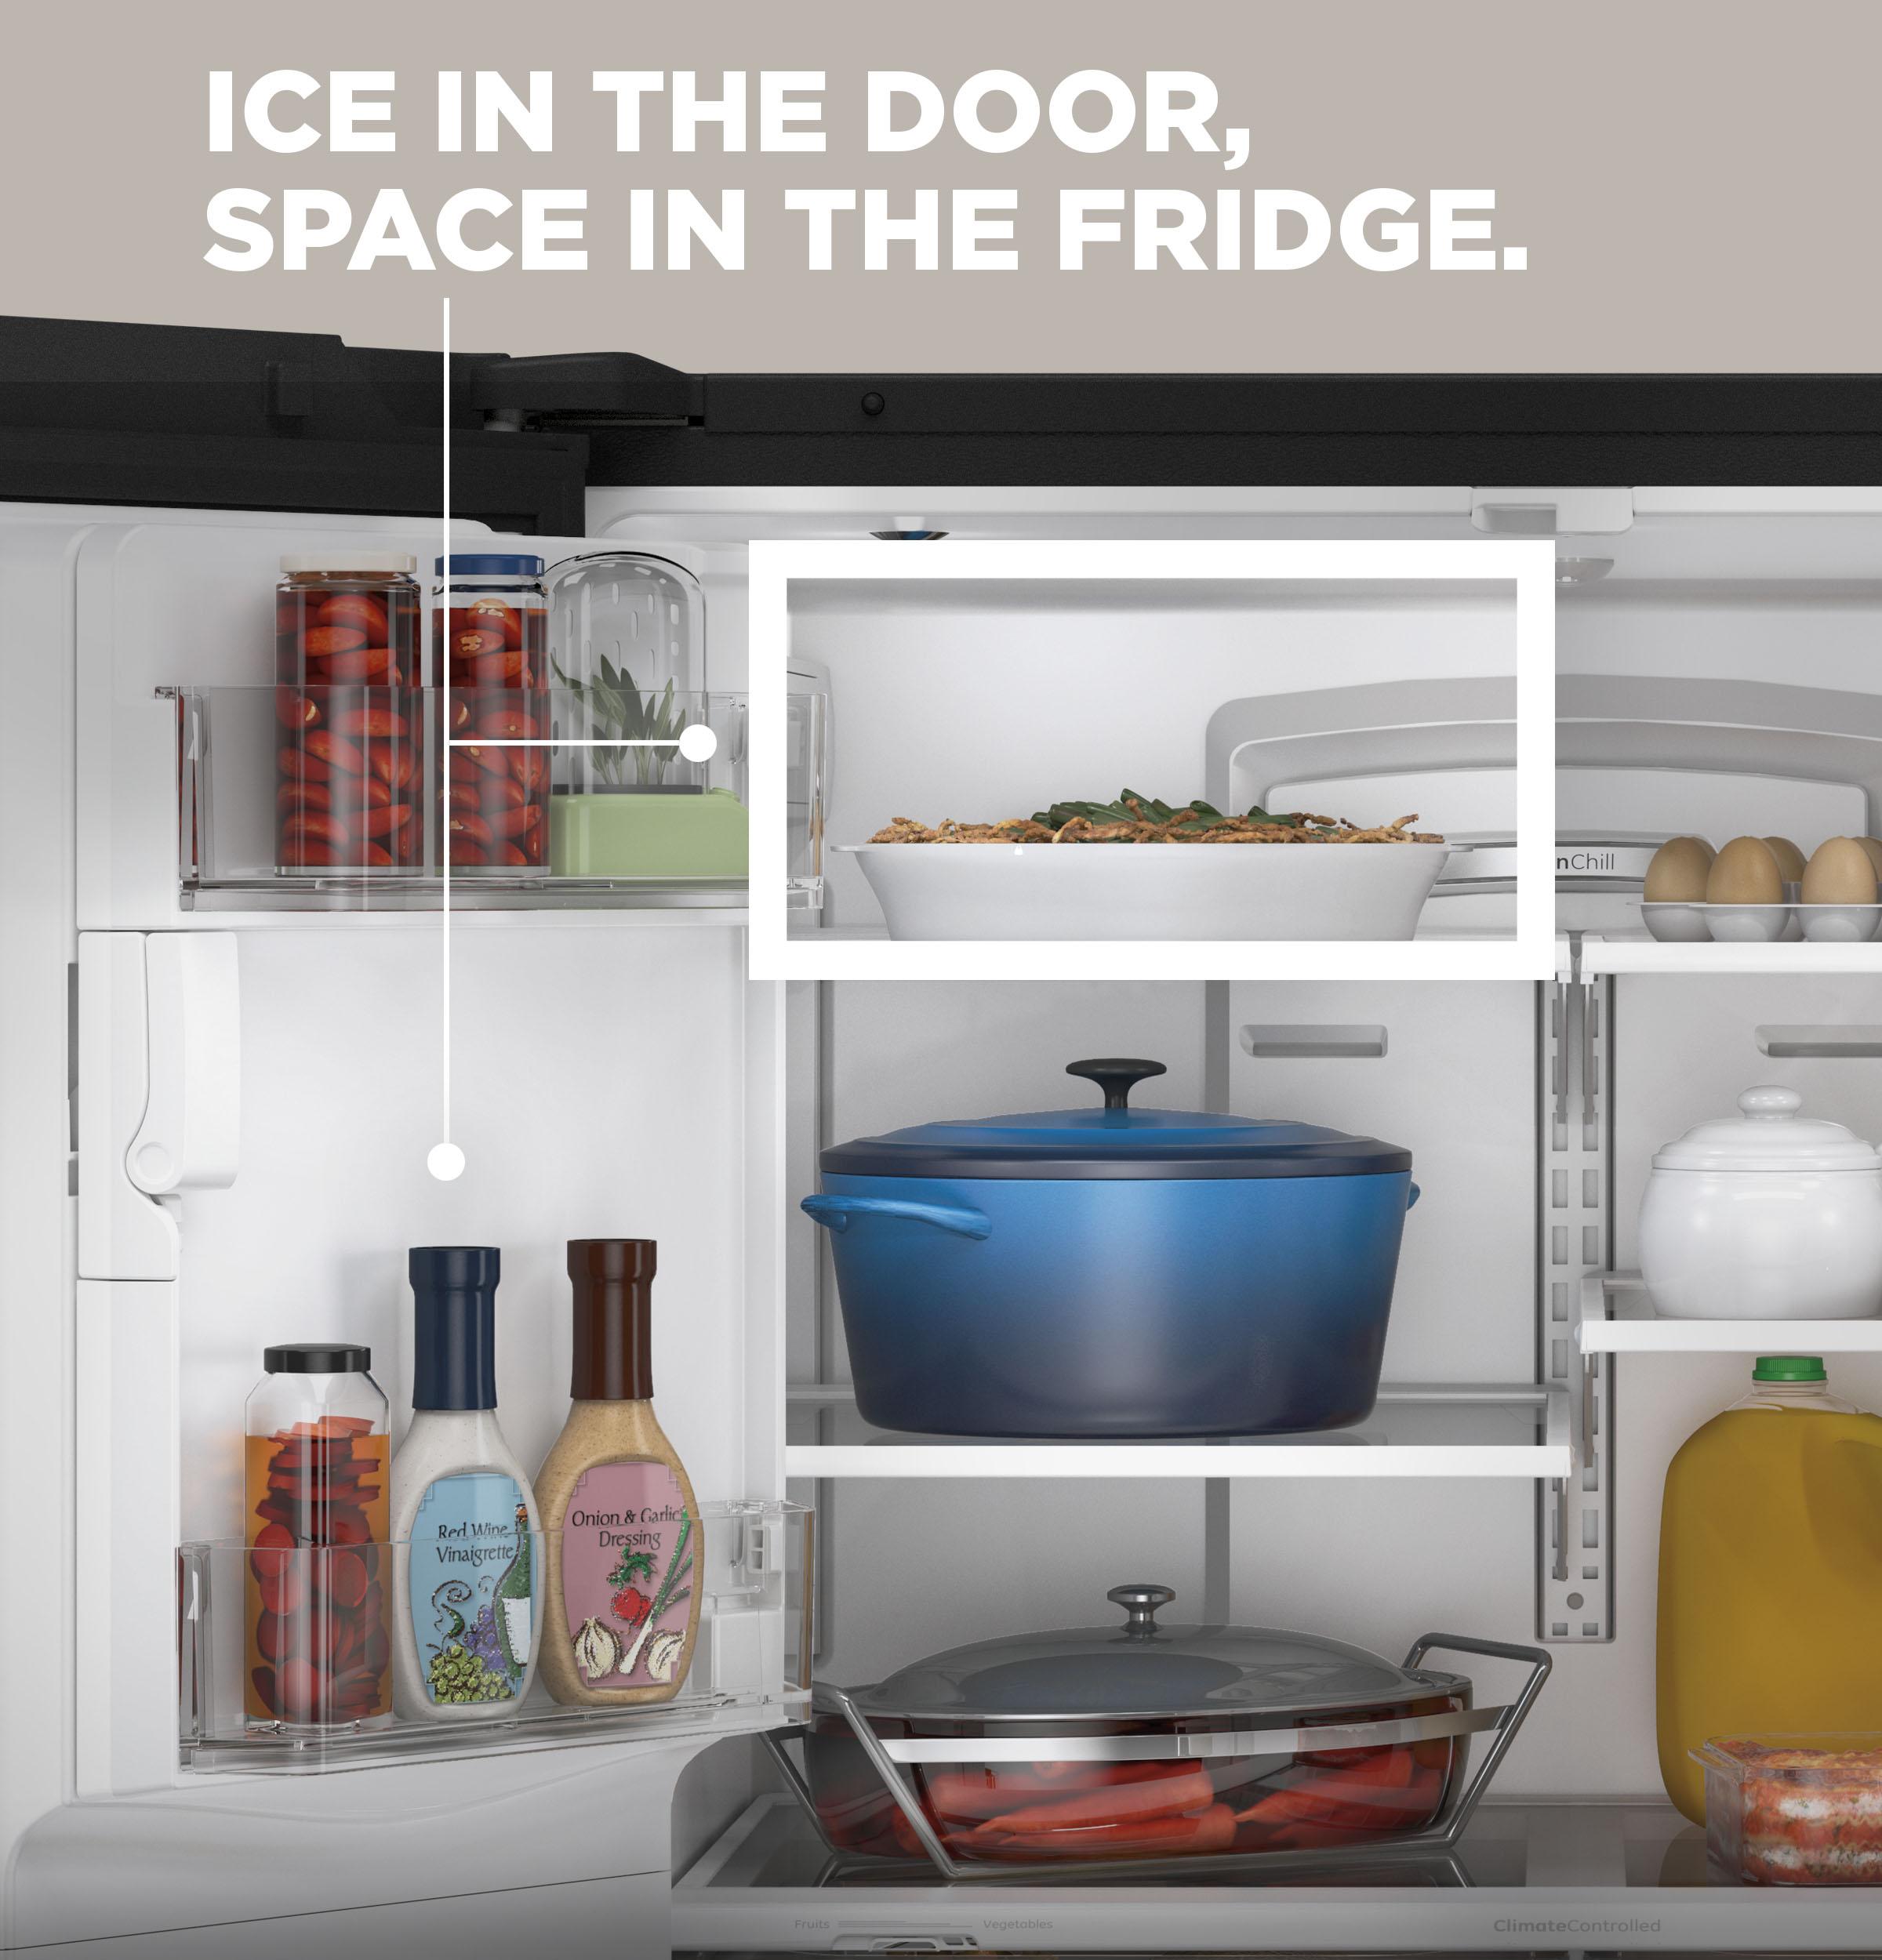 Model: GYE18JMLES | GE GE® ENERGY STAR® 17.5 Cu. Ft. Counter-Depth French-Door Refrigerator